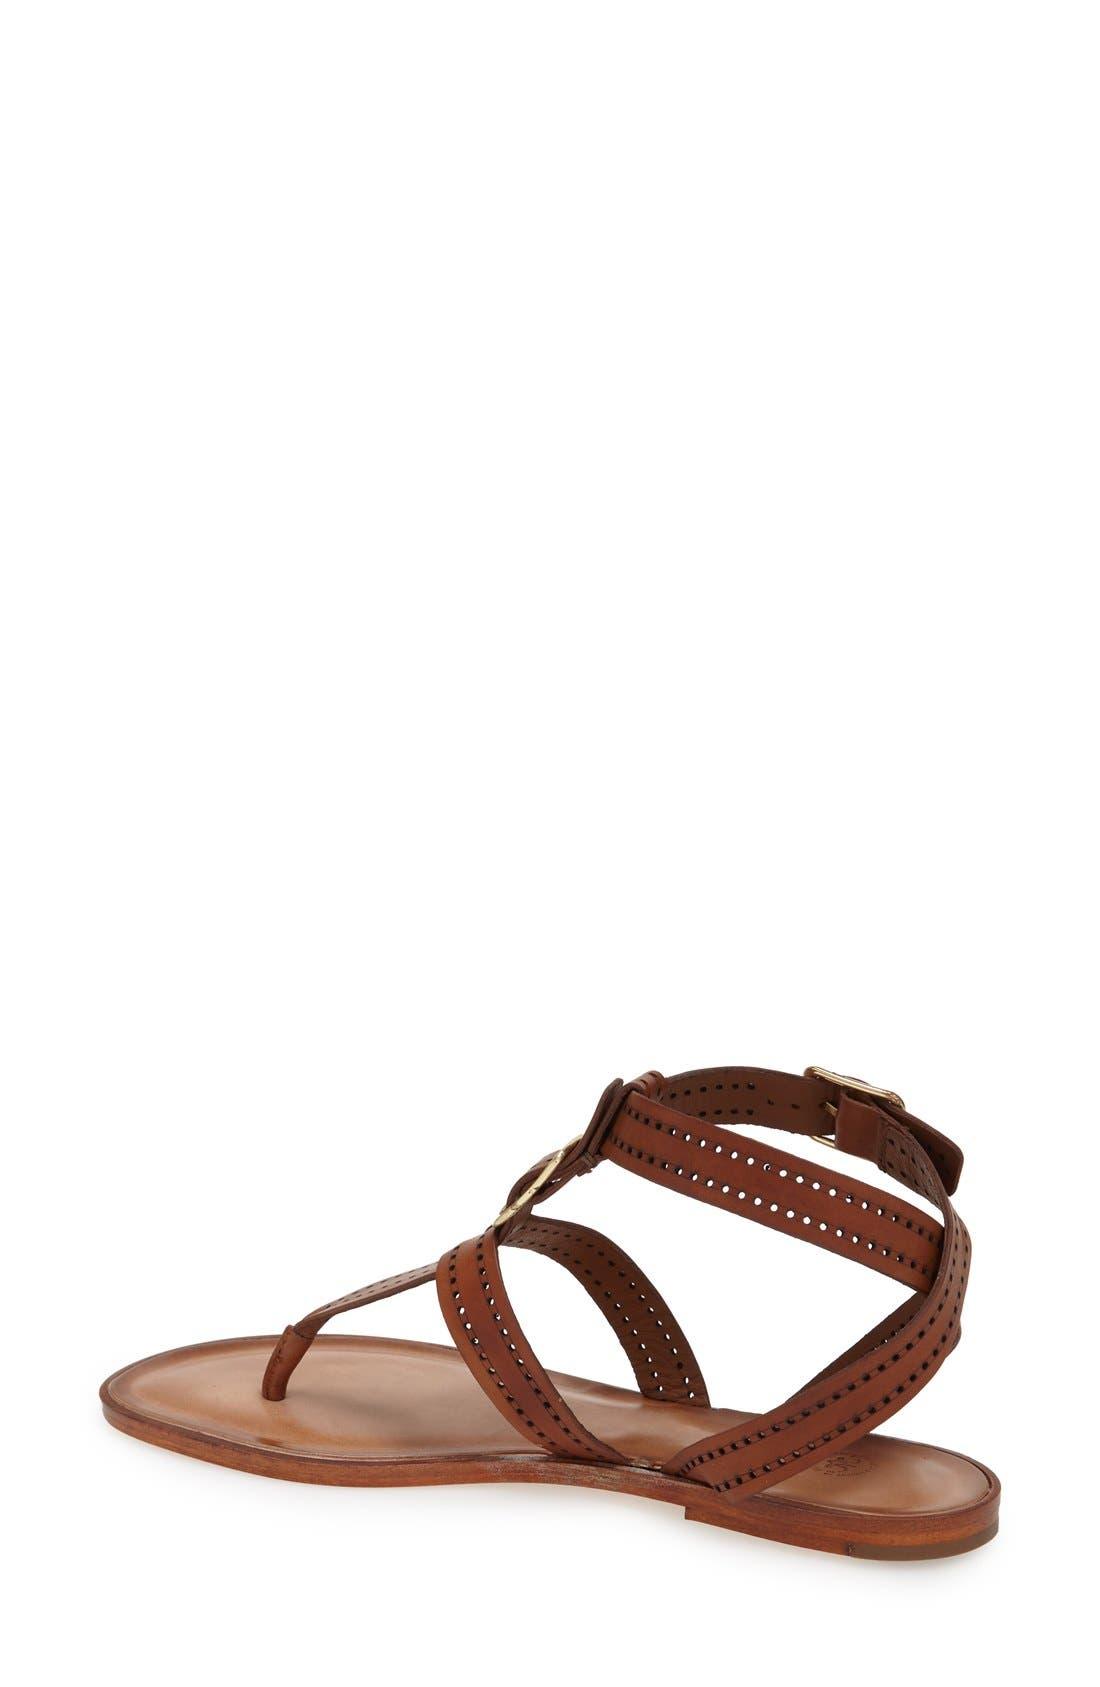 Alternate Image 2  - Johnston & Murphy 'Patti' Perforated Leather Thong Sandal (Women)